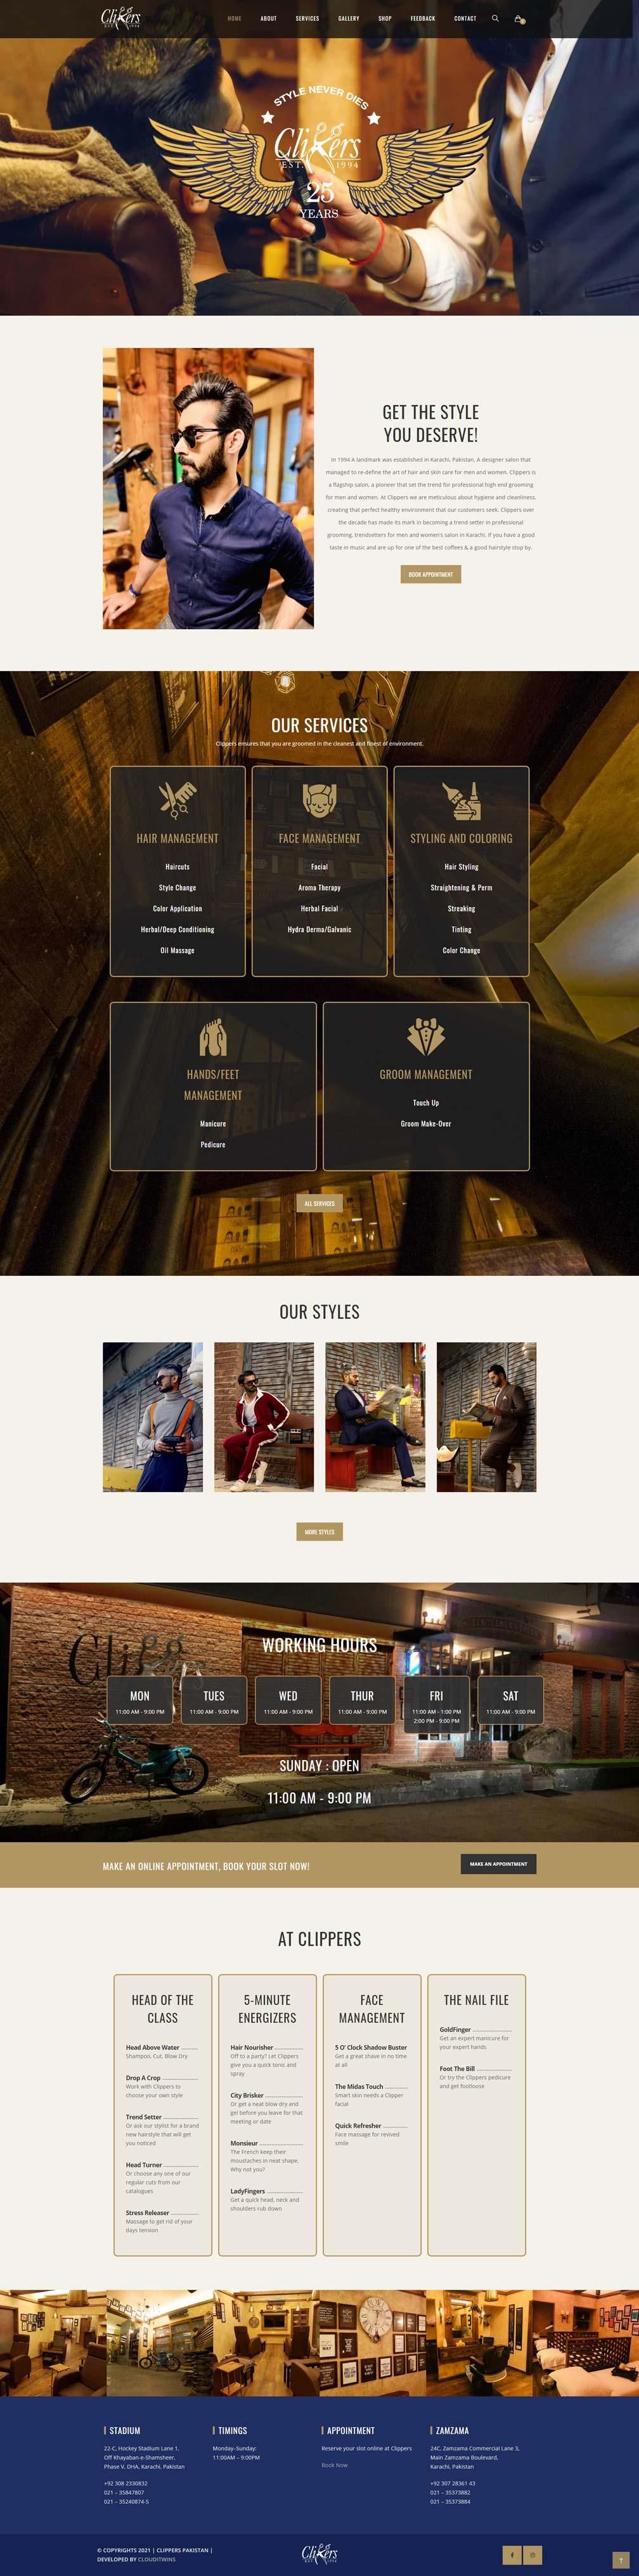 Men salon website design